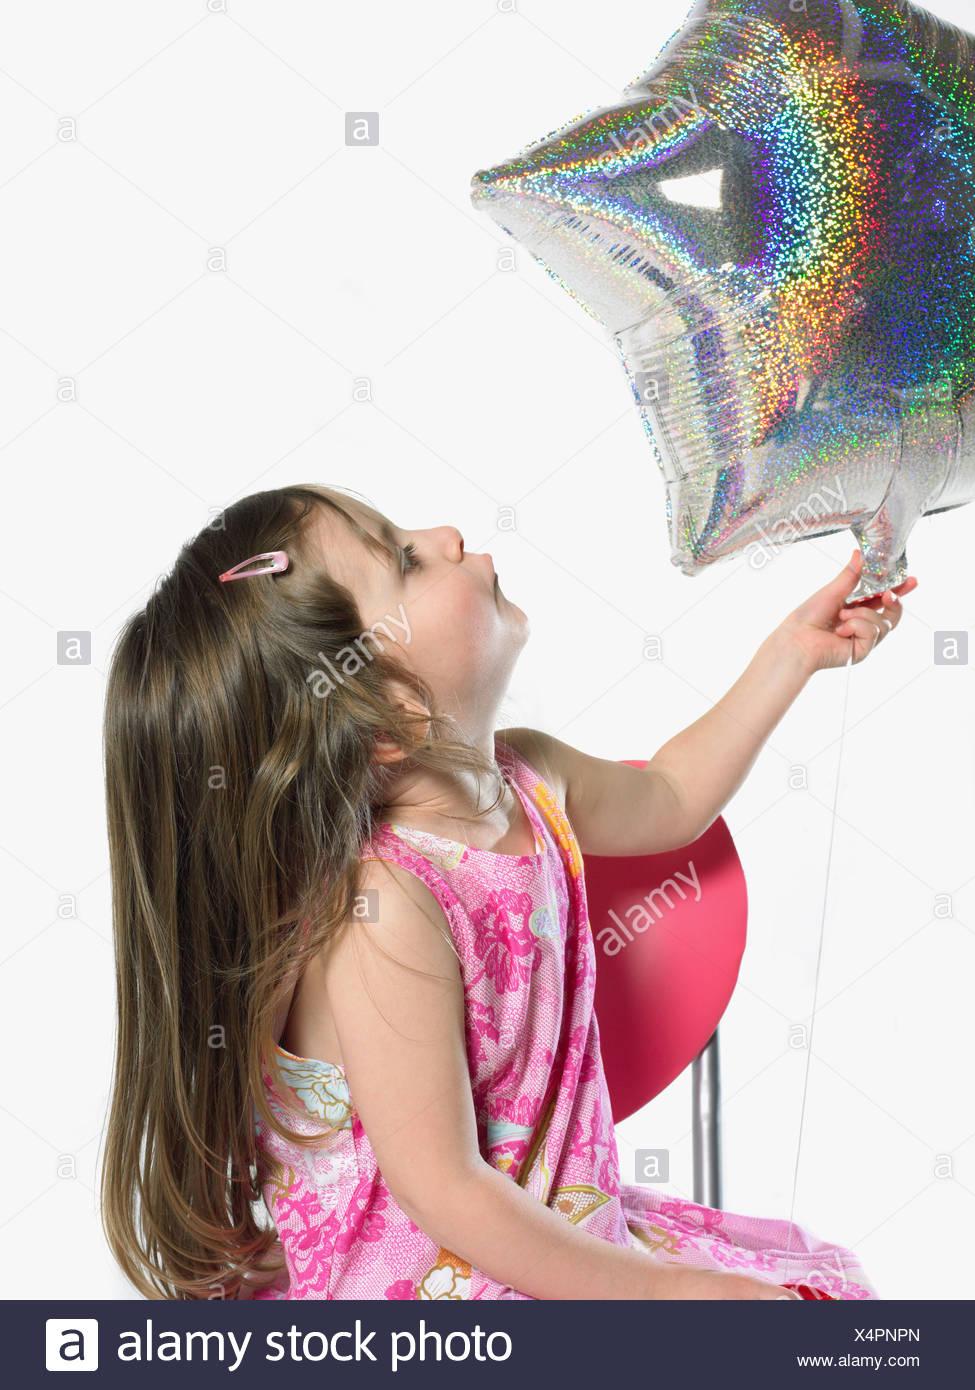 Girl with balloon - Stock Image